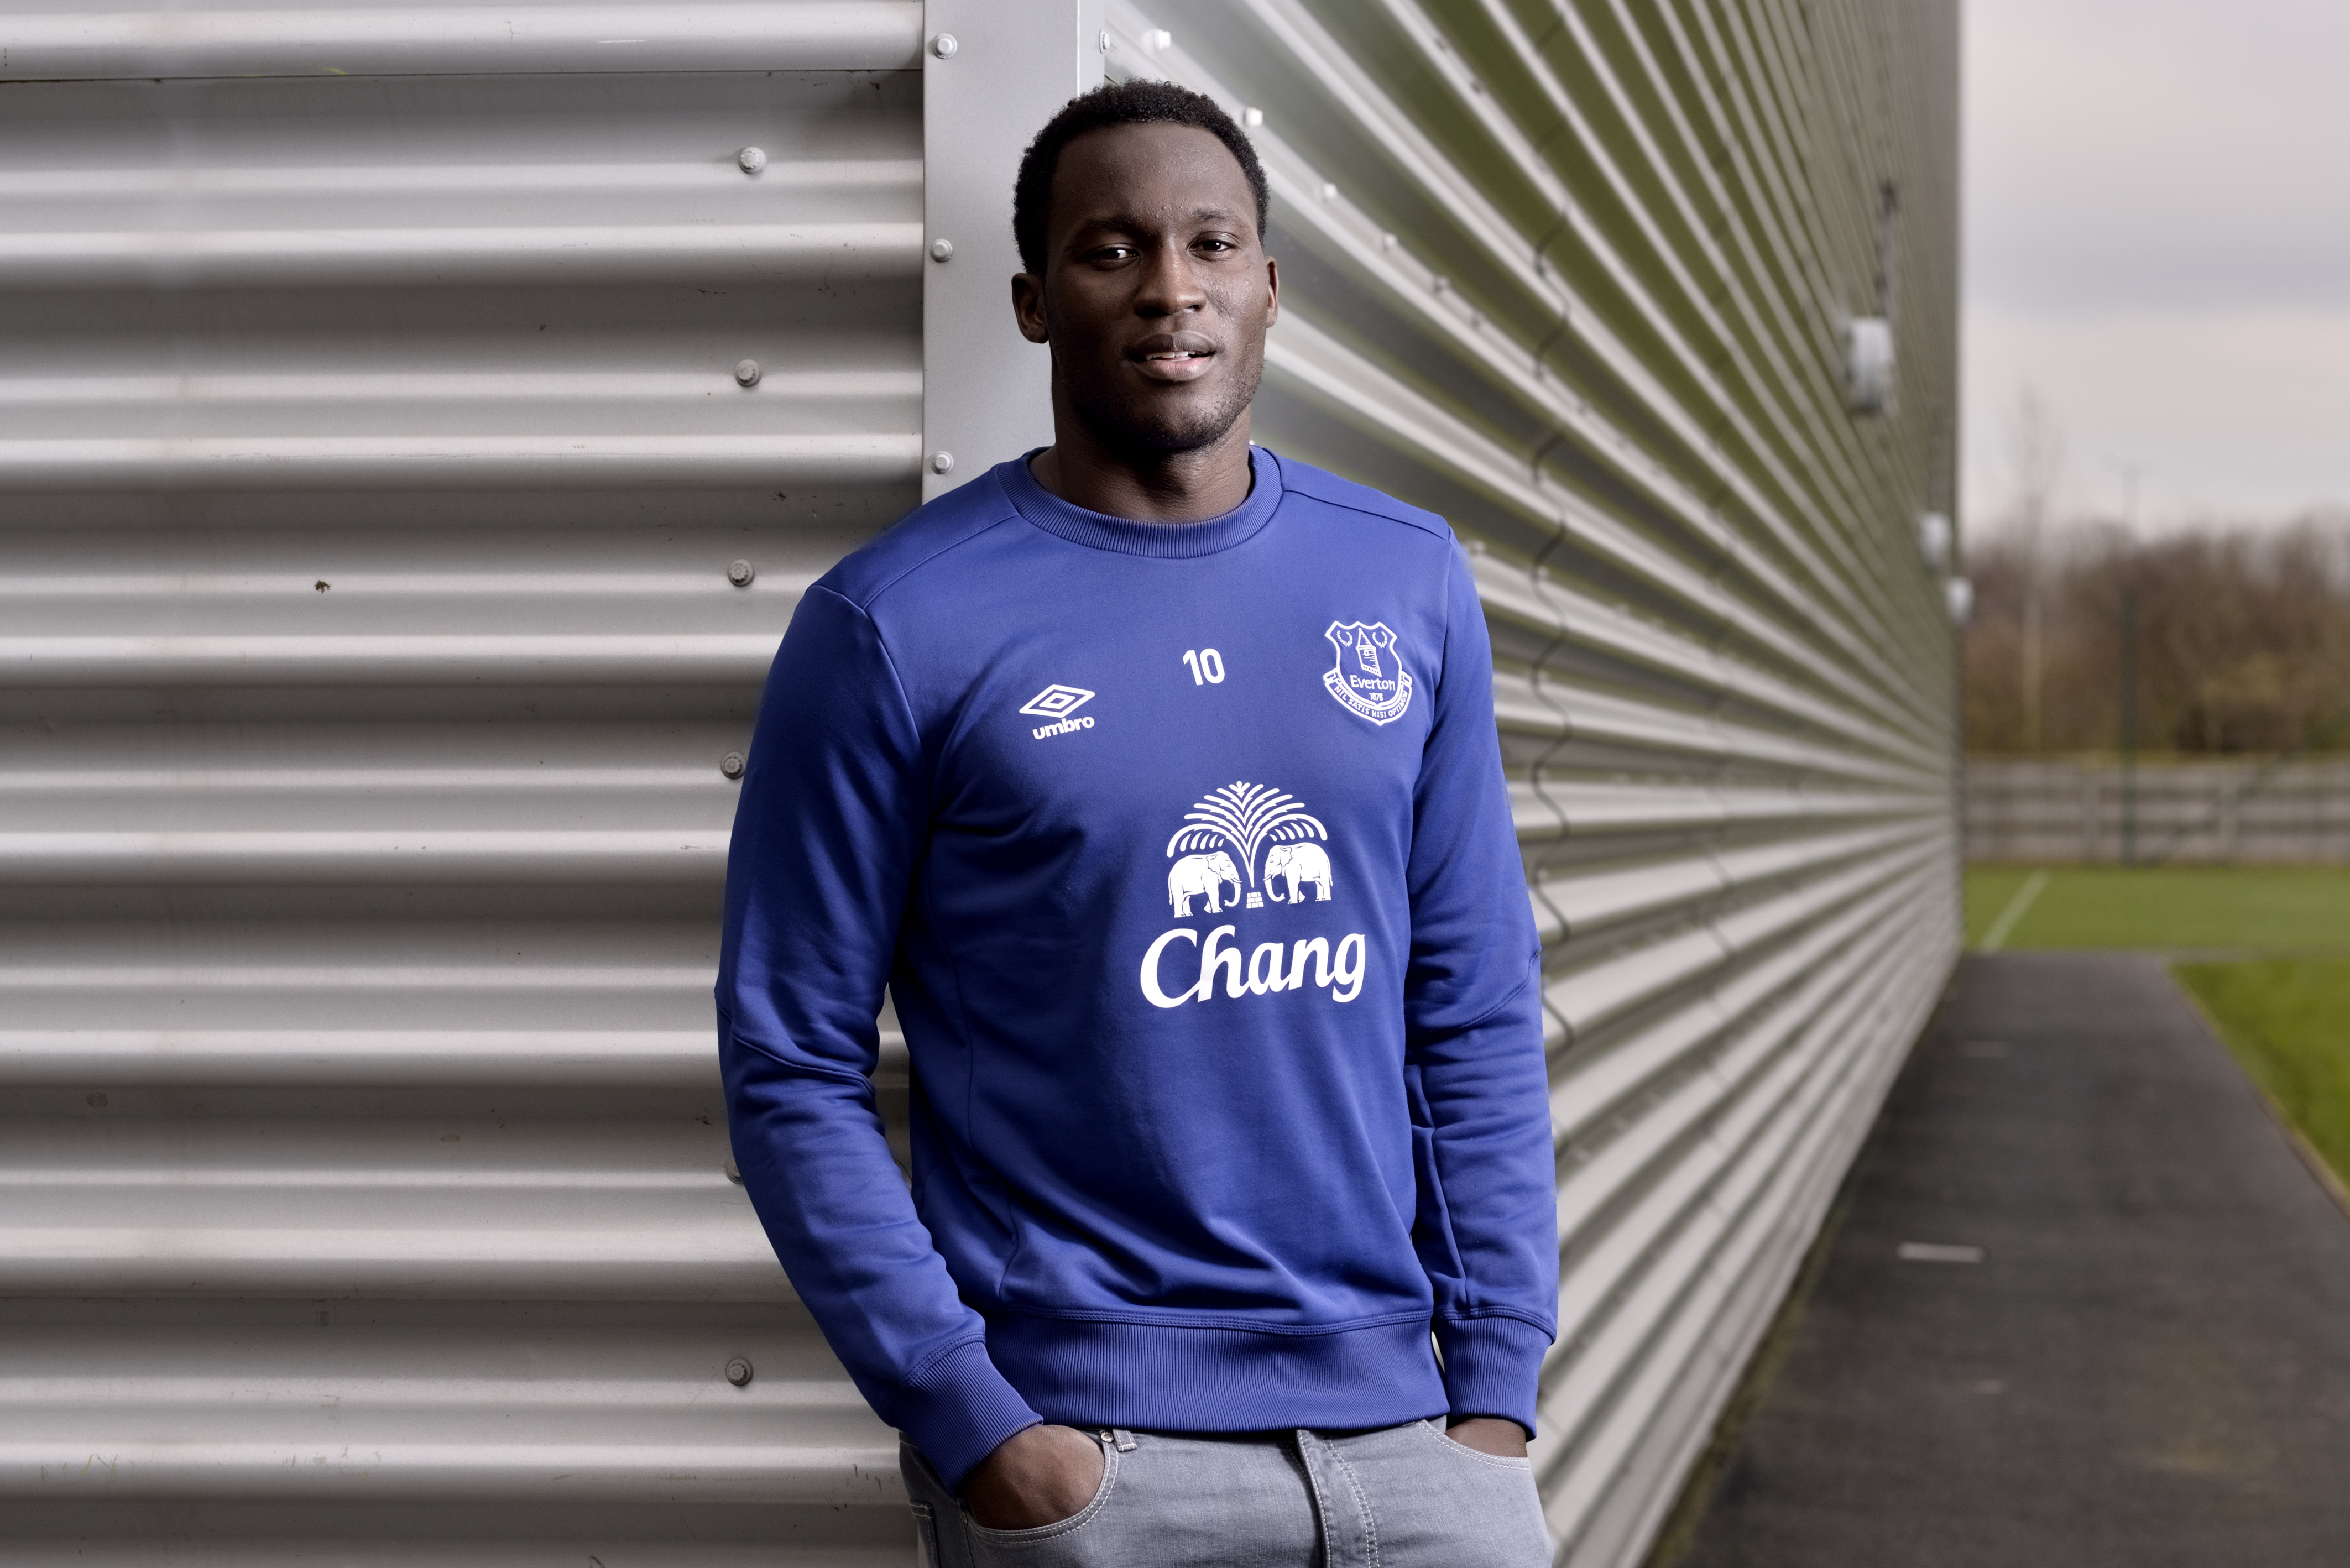 Should Manchester United Sign Harry Kane or Romelu Lukaku